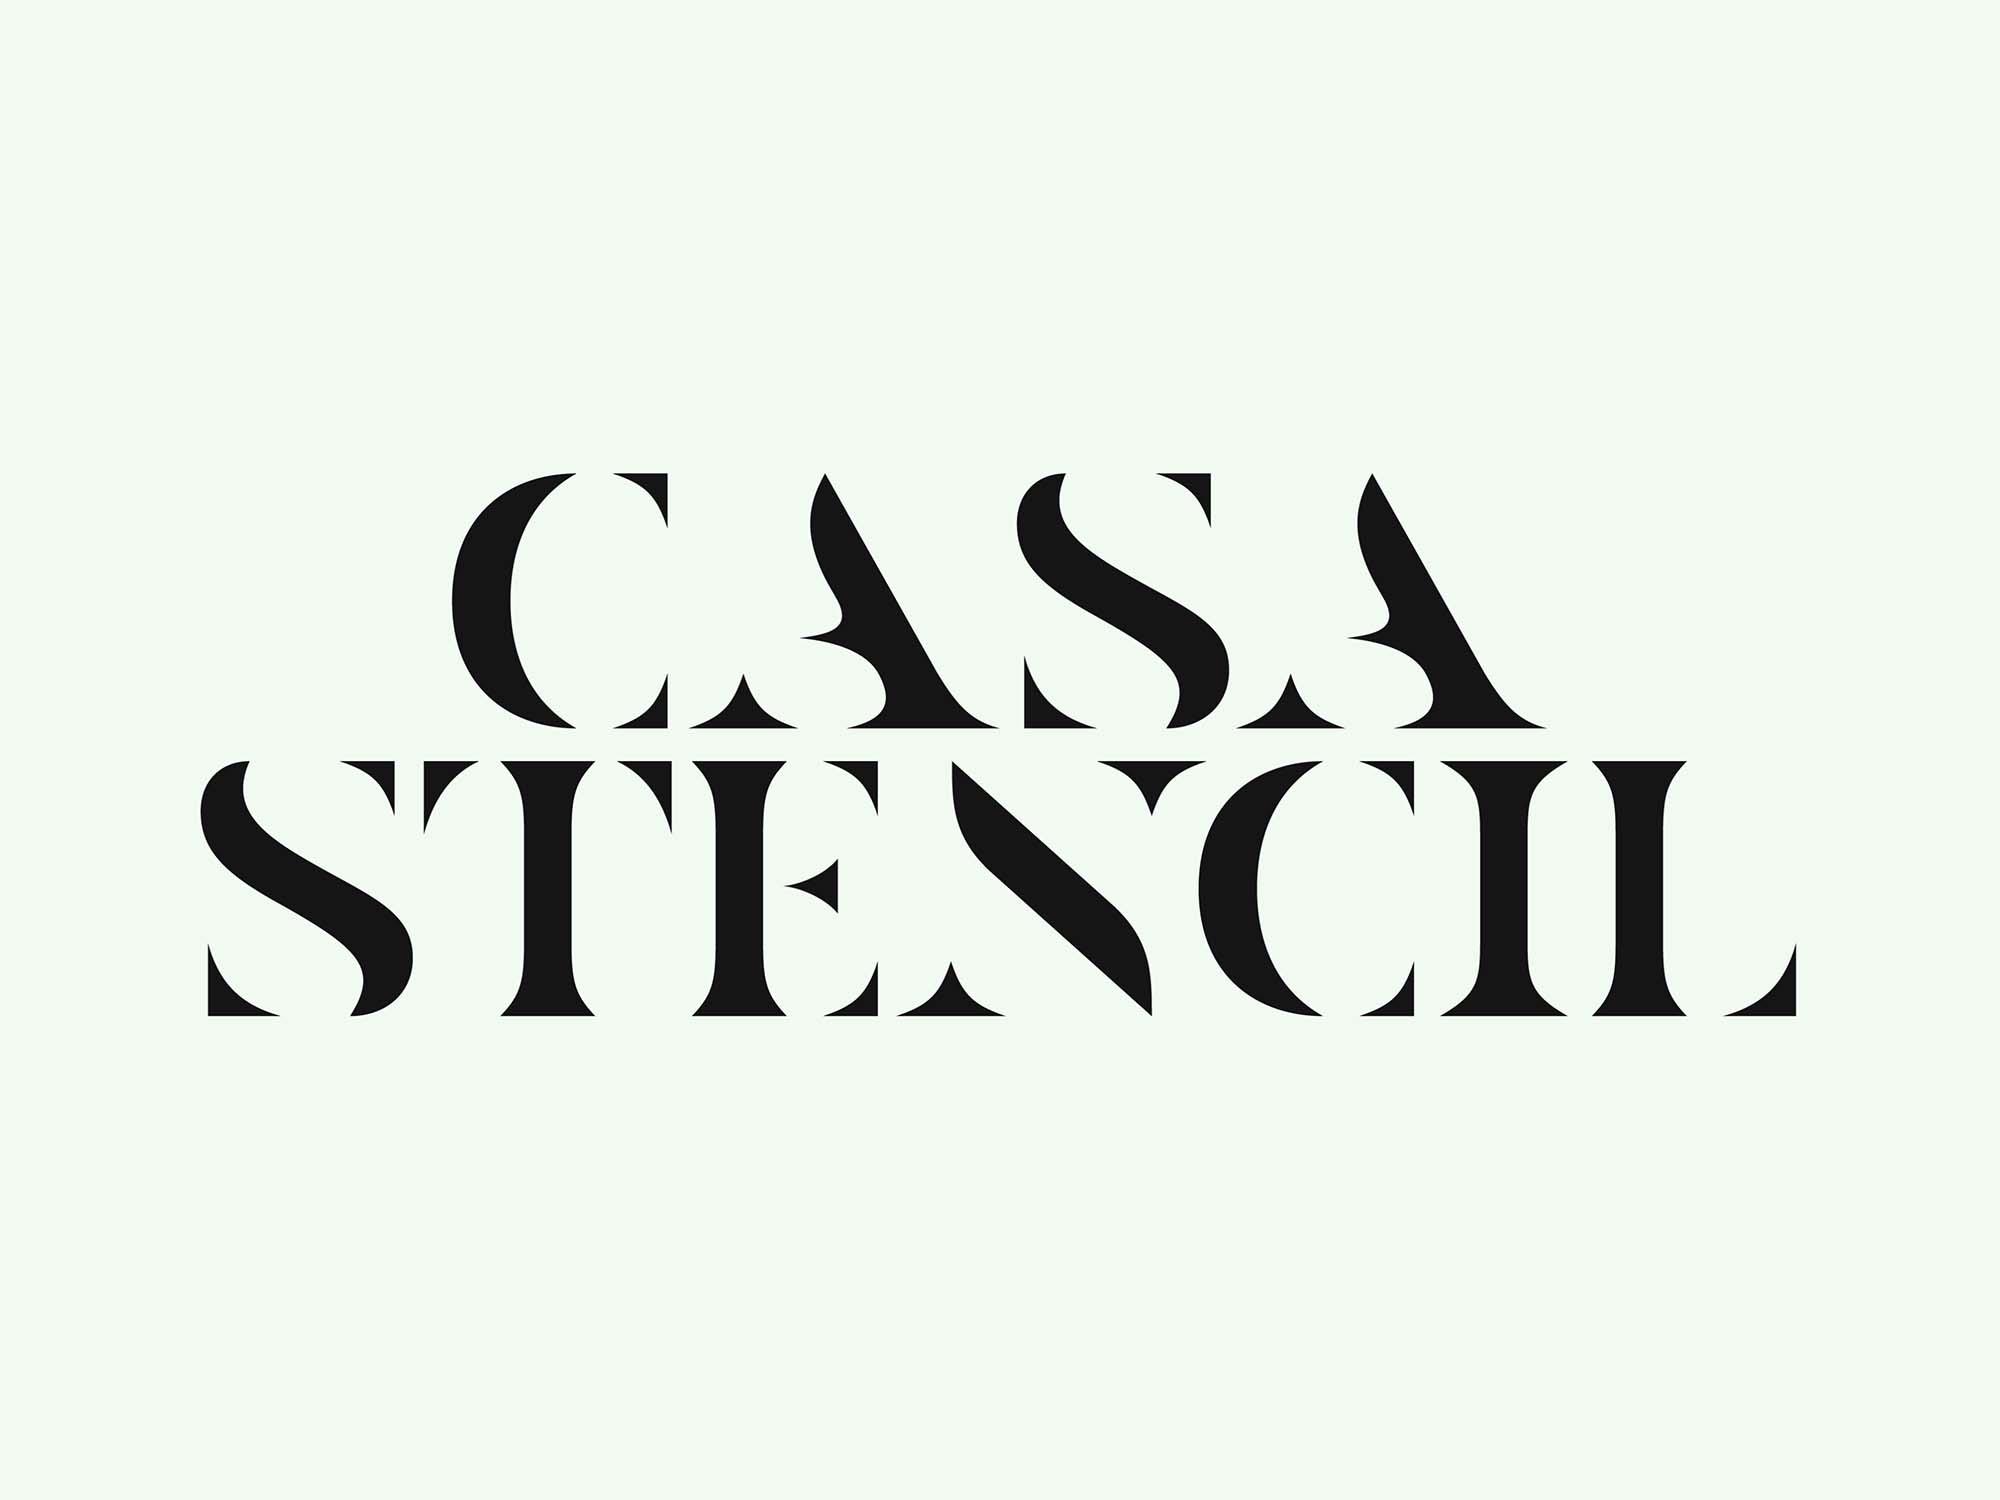 stencil font free - Ataum berglauf-verband com